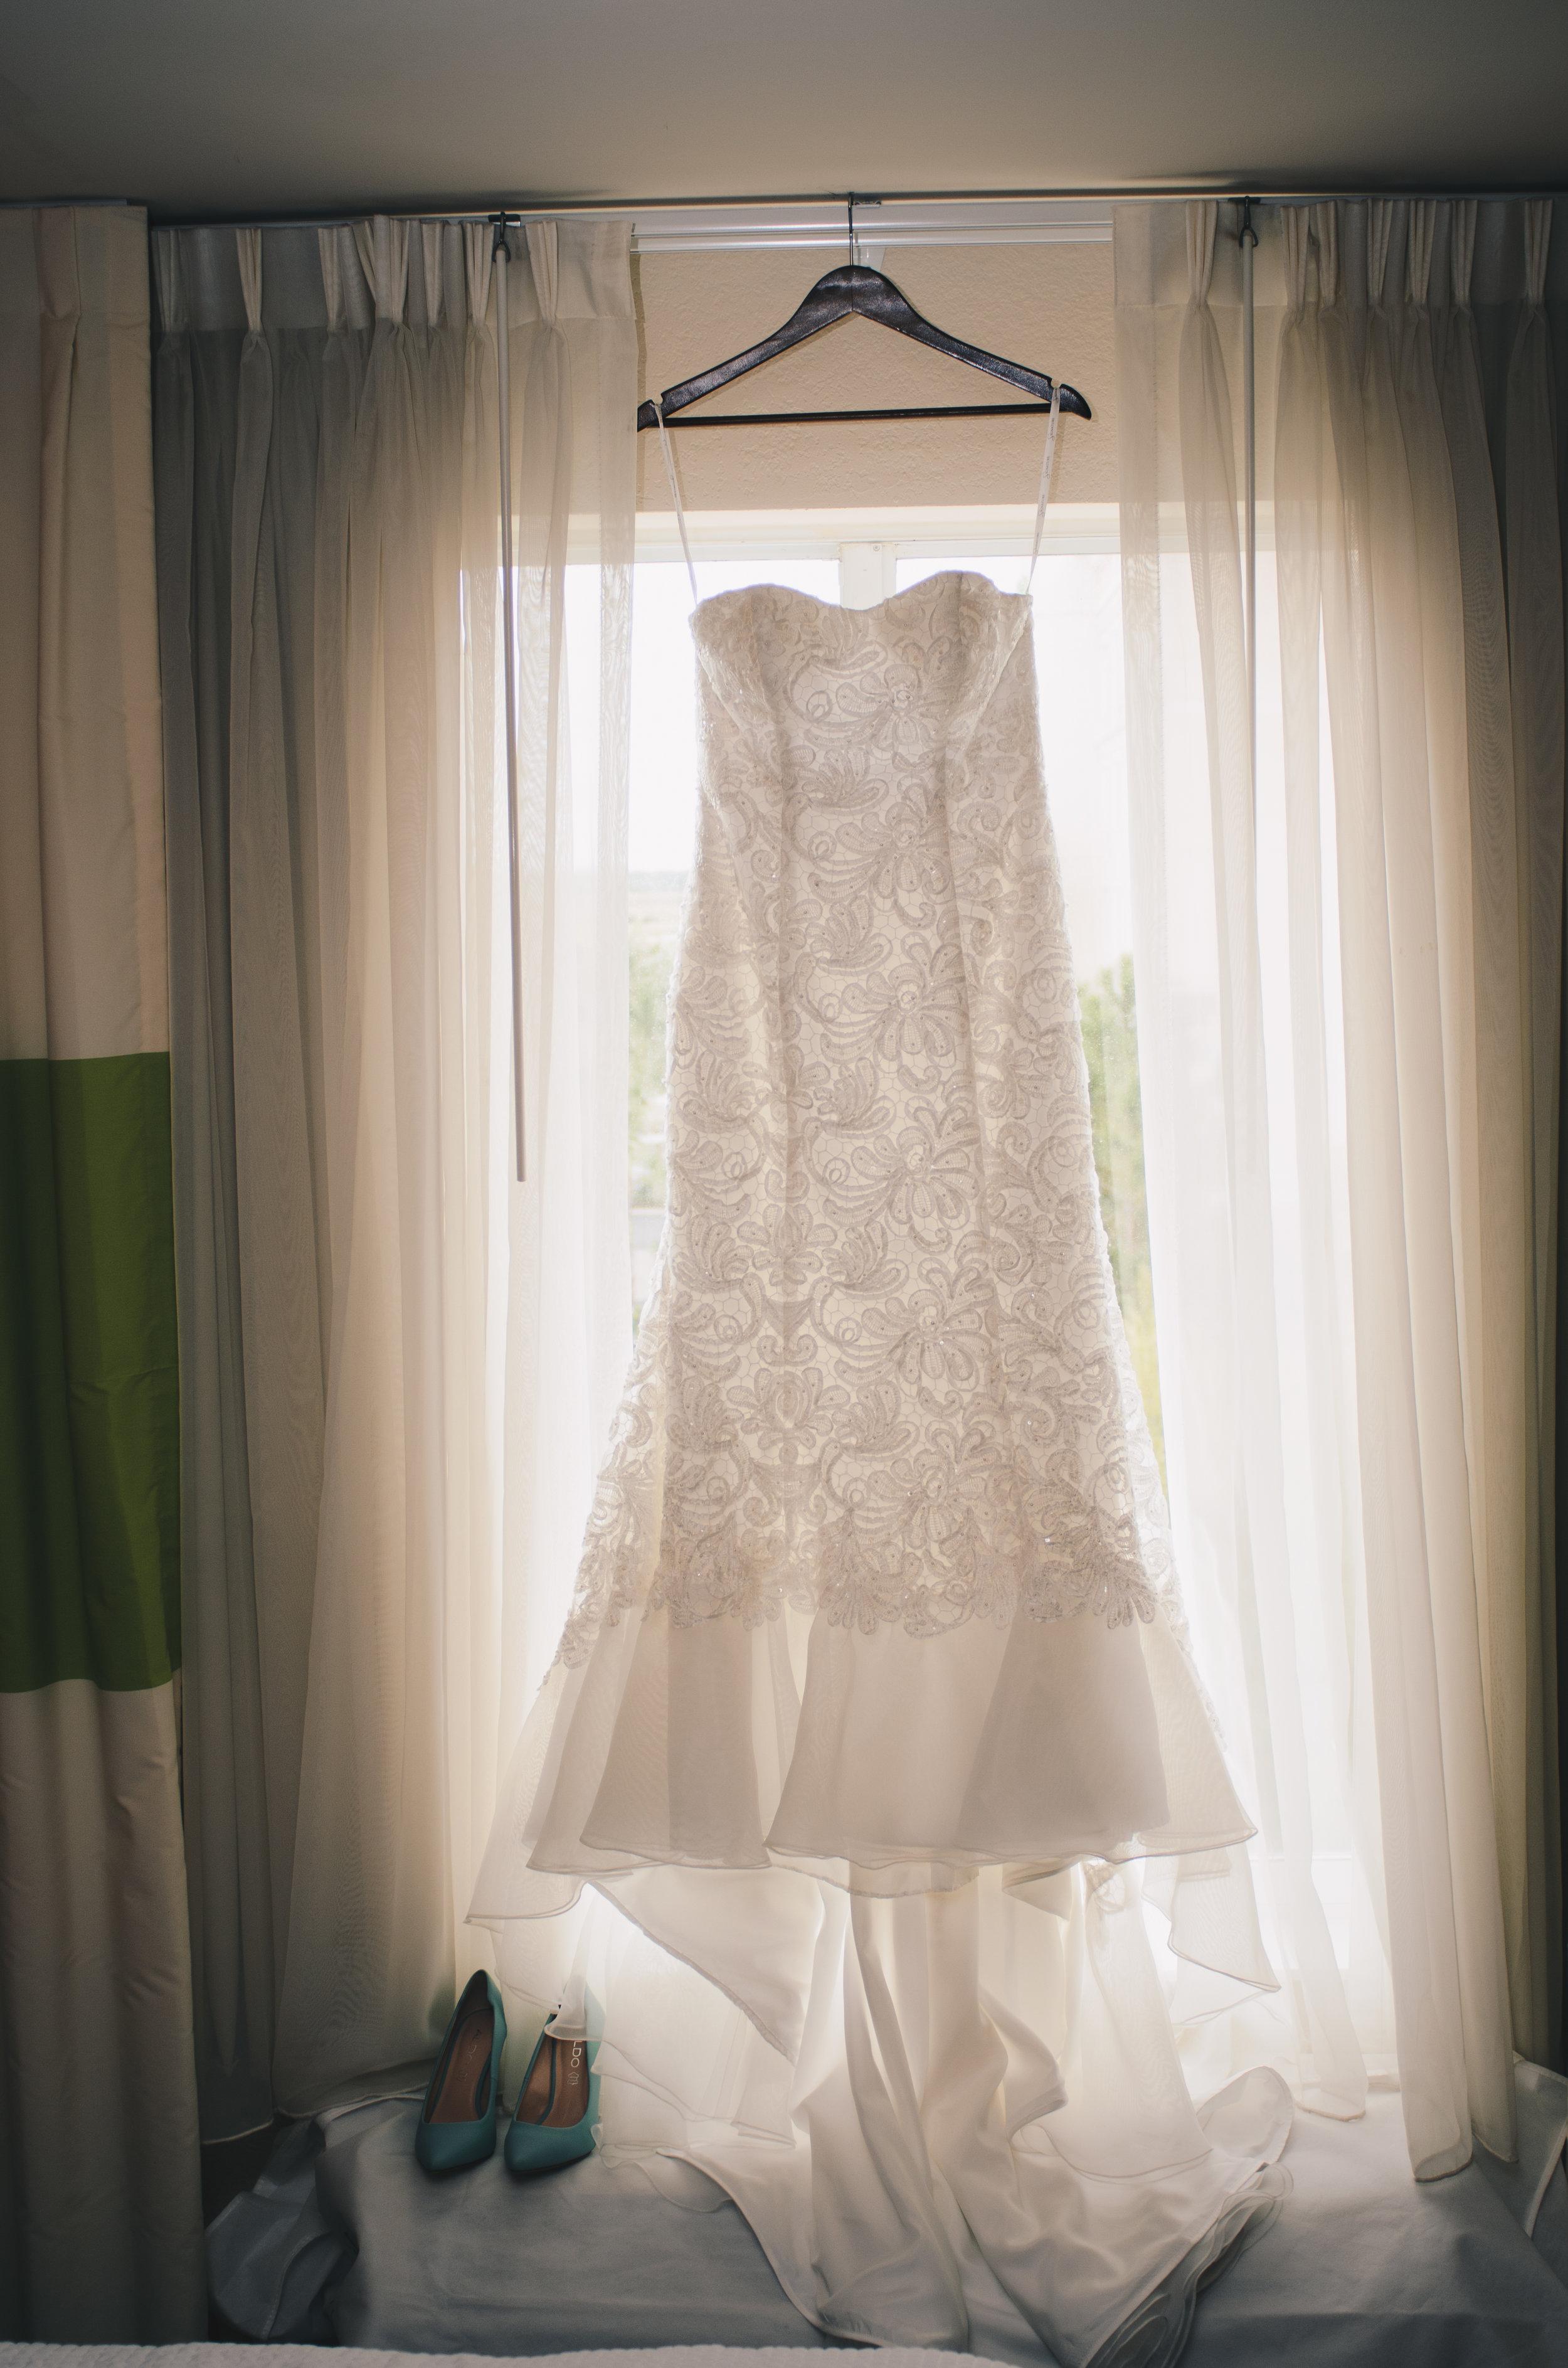 central-fl-christian-wedding-day-1.jpg